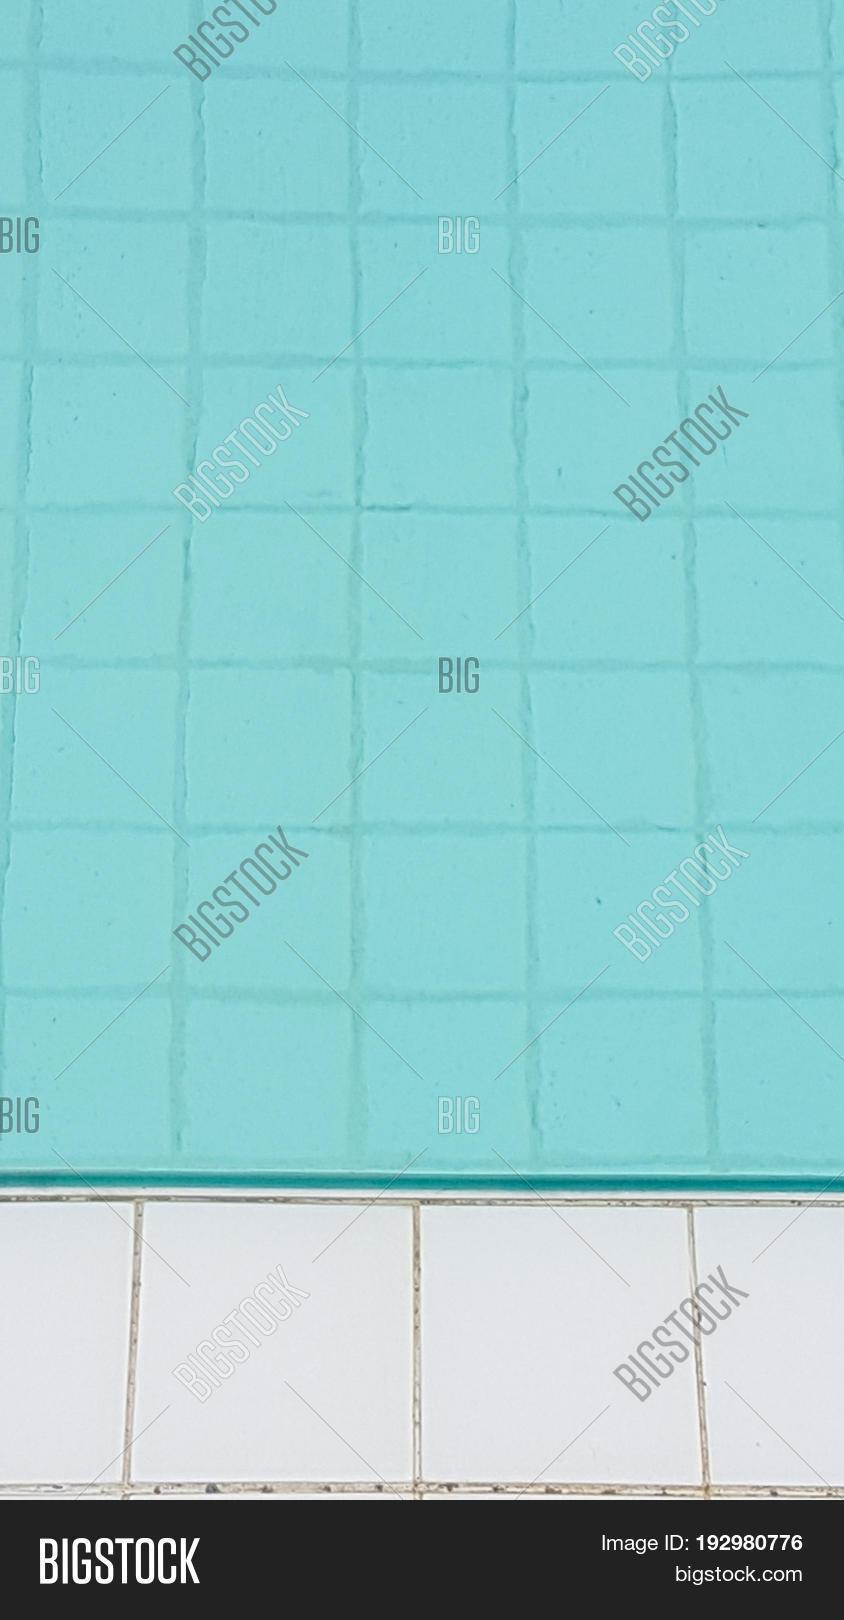 White Tile Deside Image & Photo (Free Trial) | Bigstock